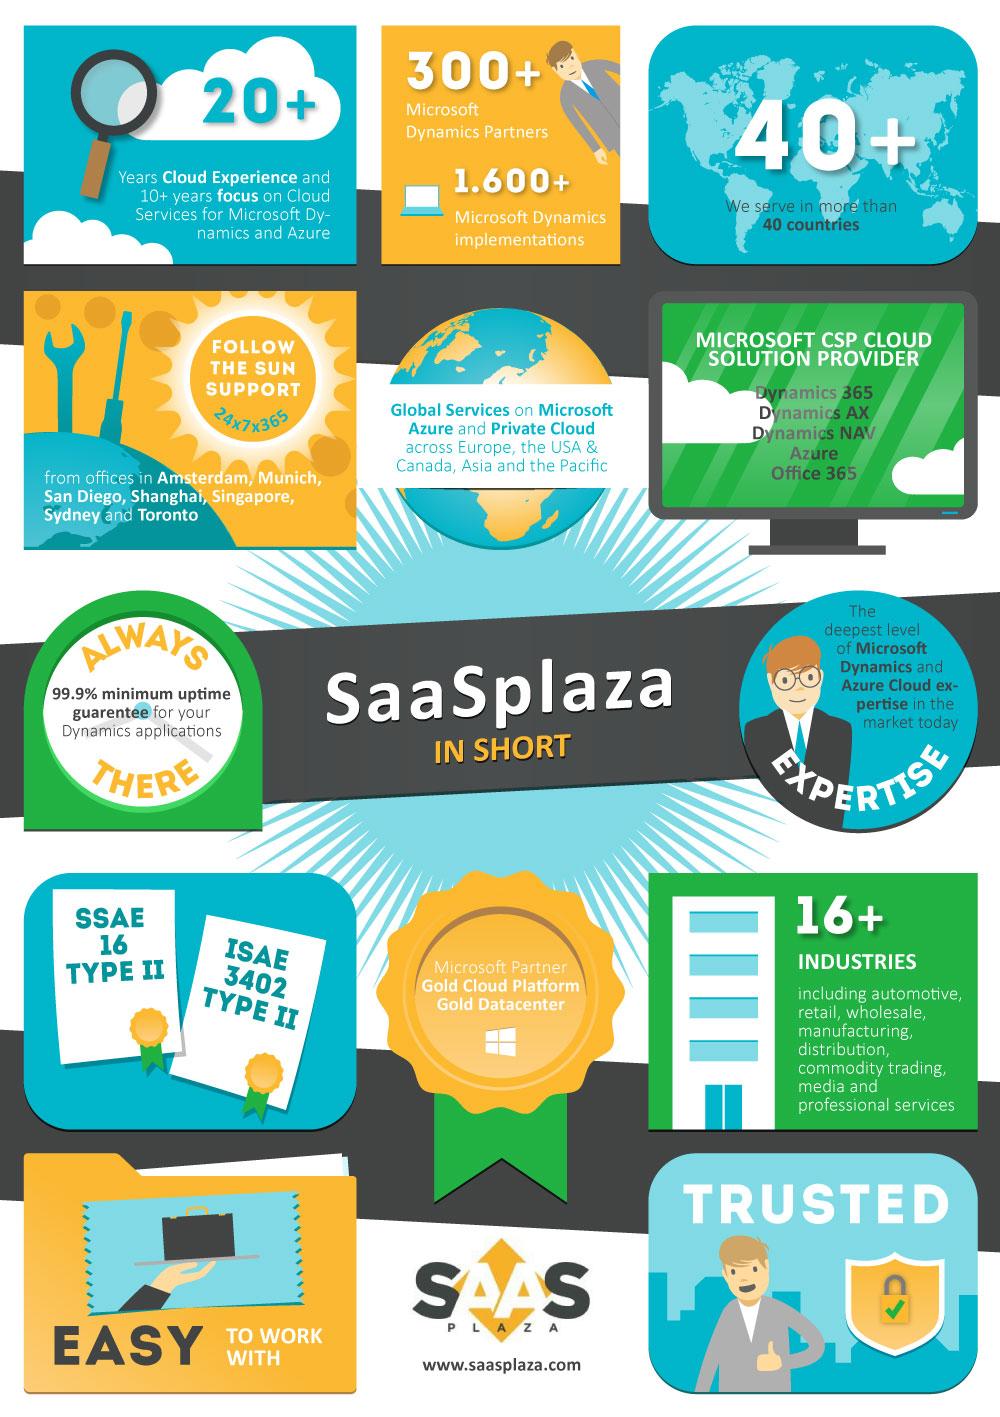 portfolio-dimgray-MMM-saasplaza-infographic-4